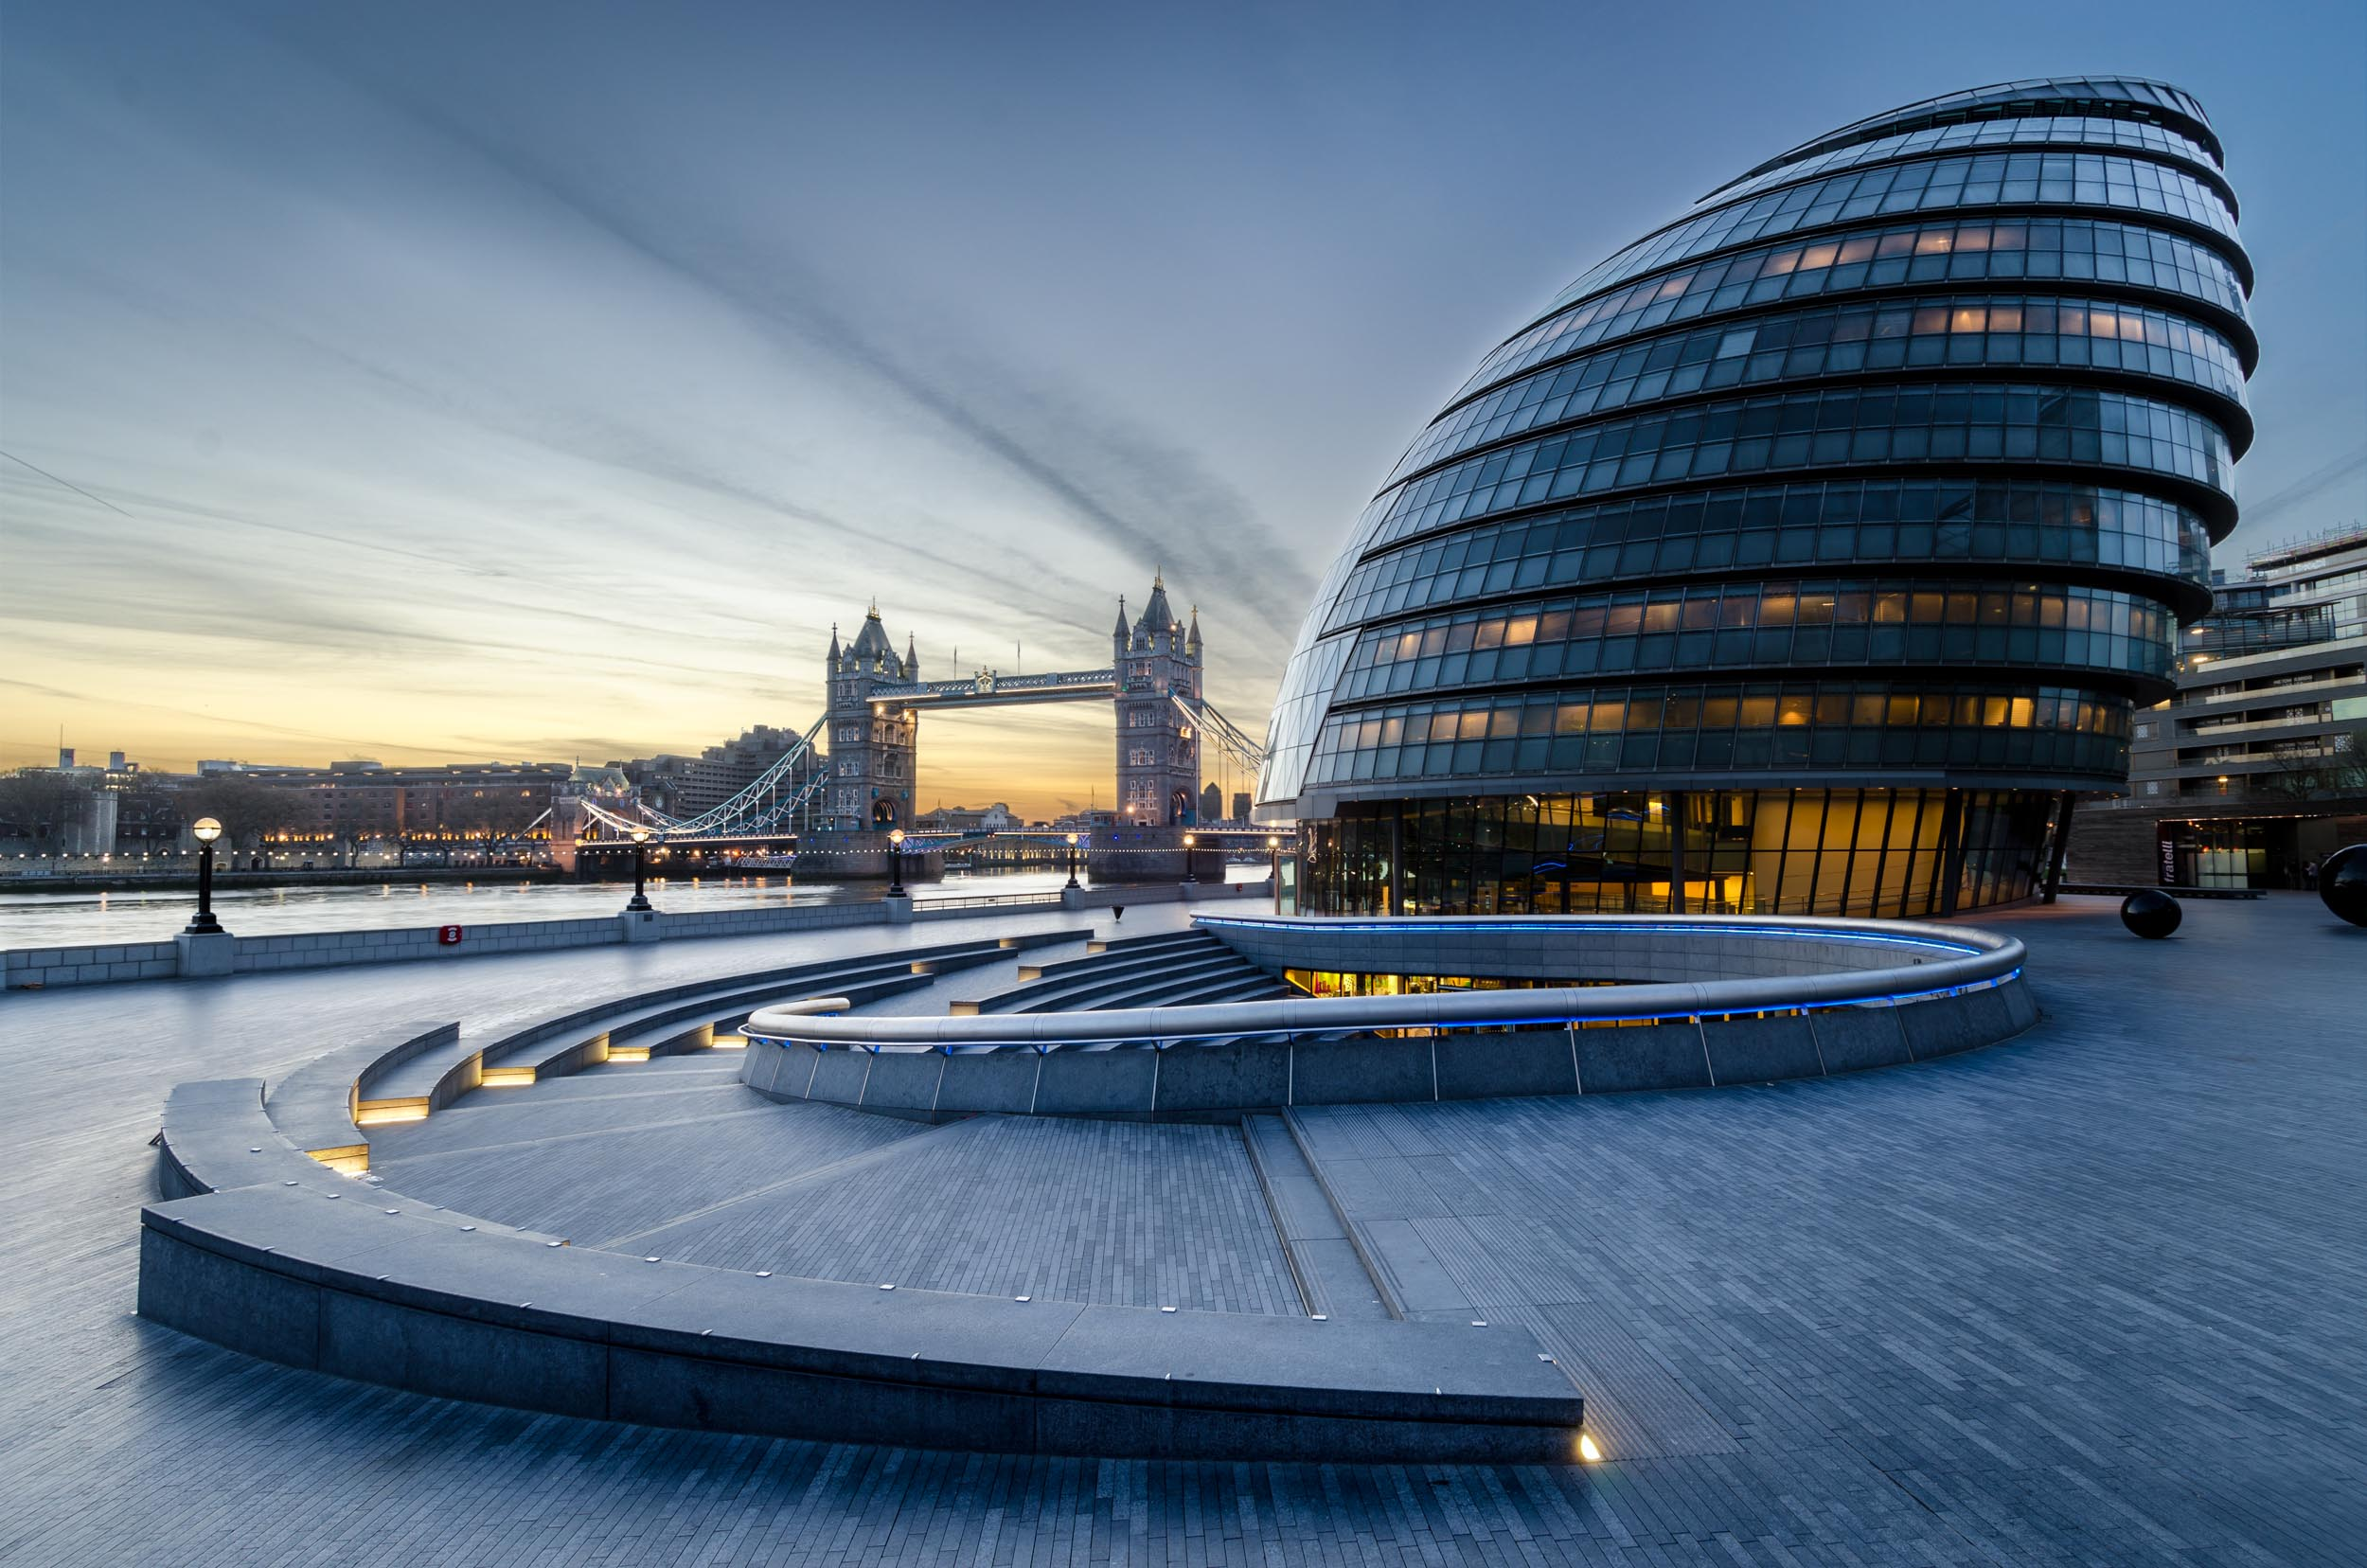 city hall london bridge architectural exterior.jpg